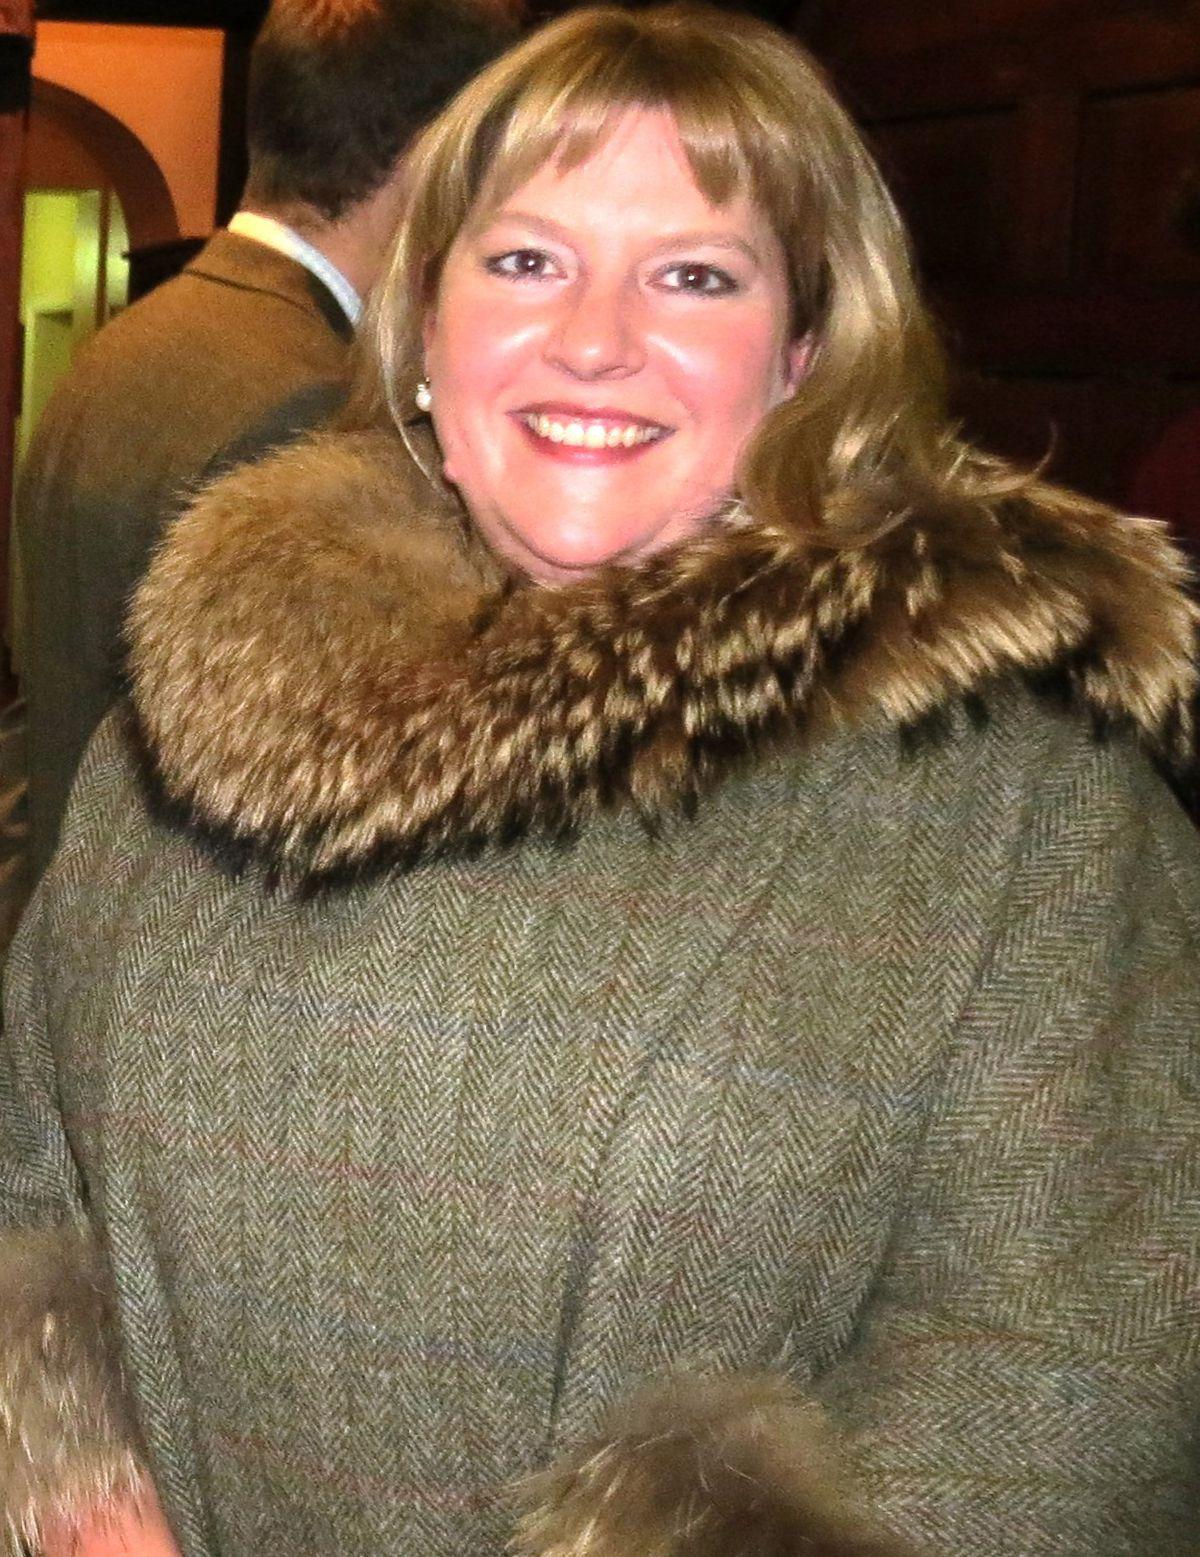 Charlotte Marrison is Shropshire branch chairman, GWCT